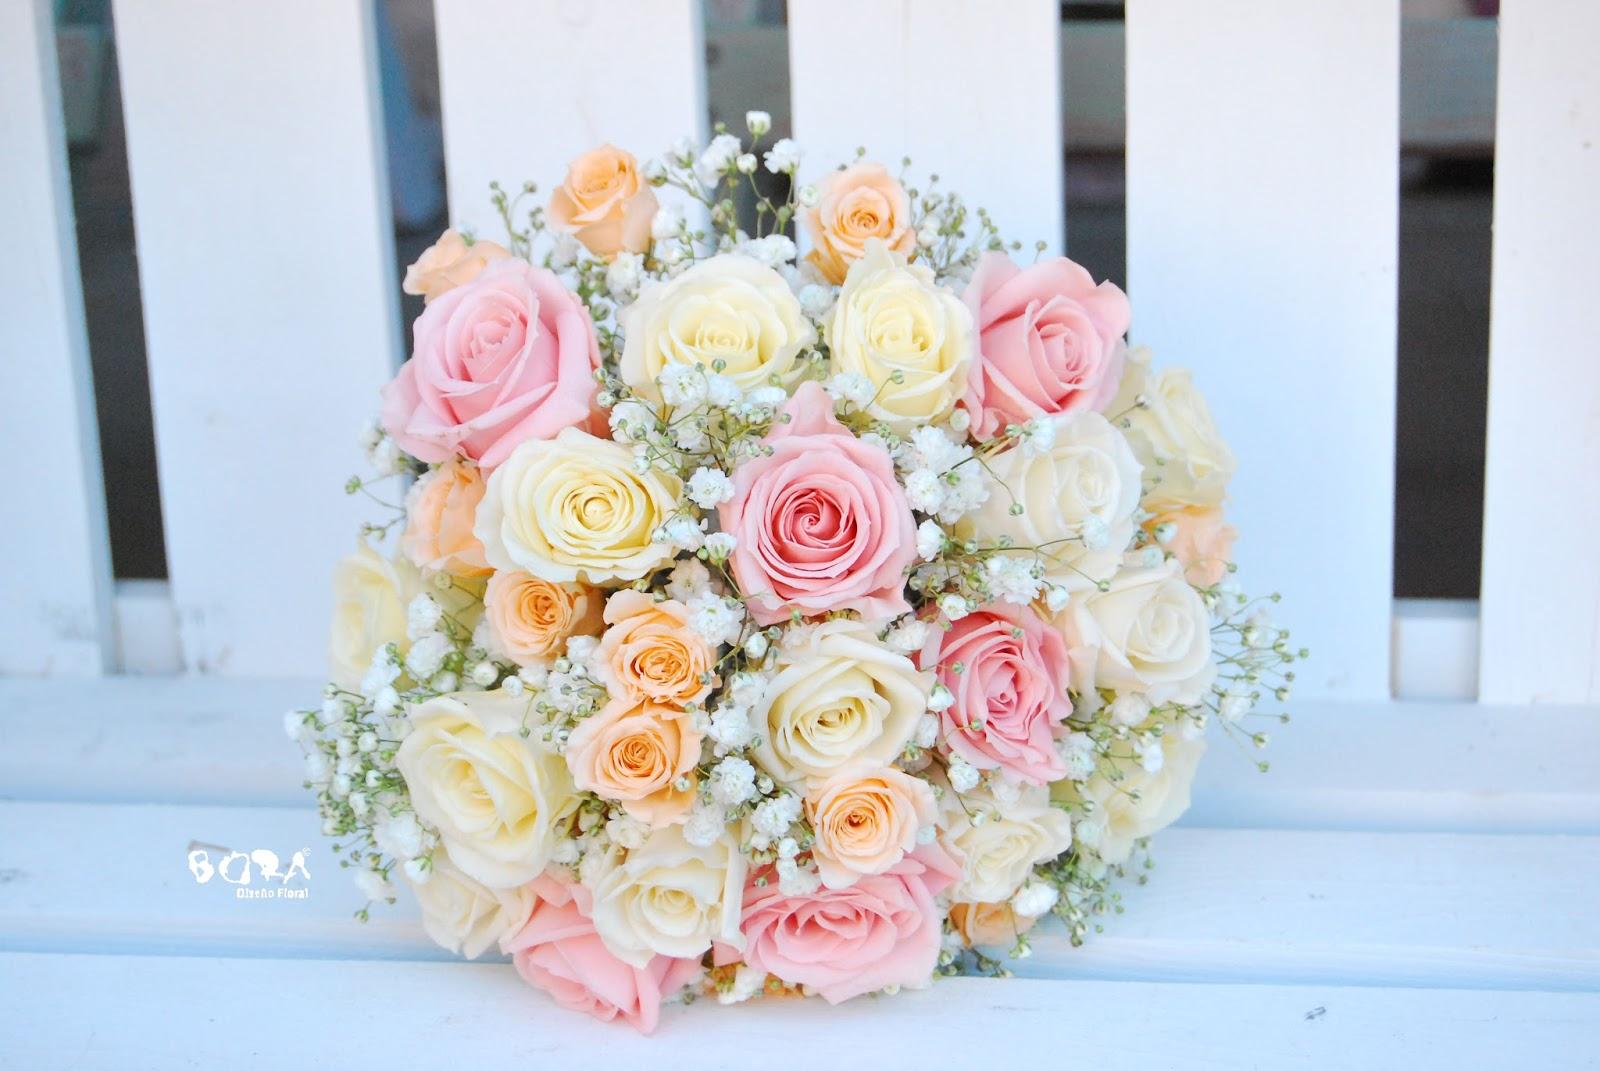 Bora dise o floral ramo de novia de rosas preservadas - Ramos de calas para novias ...